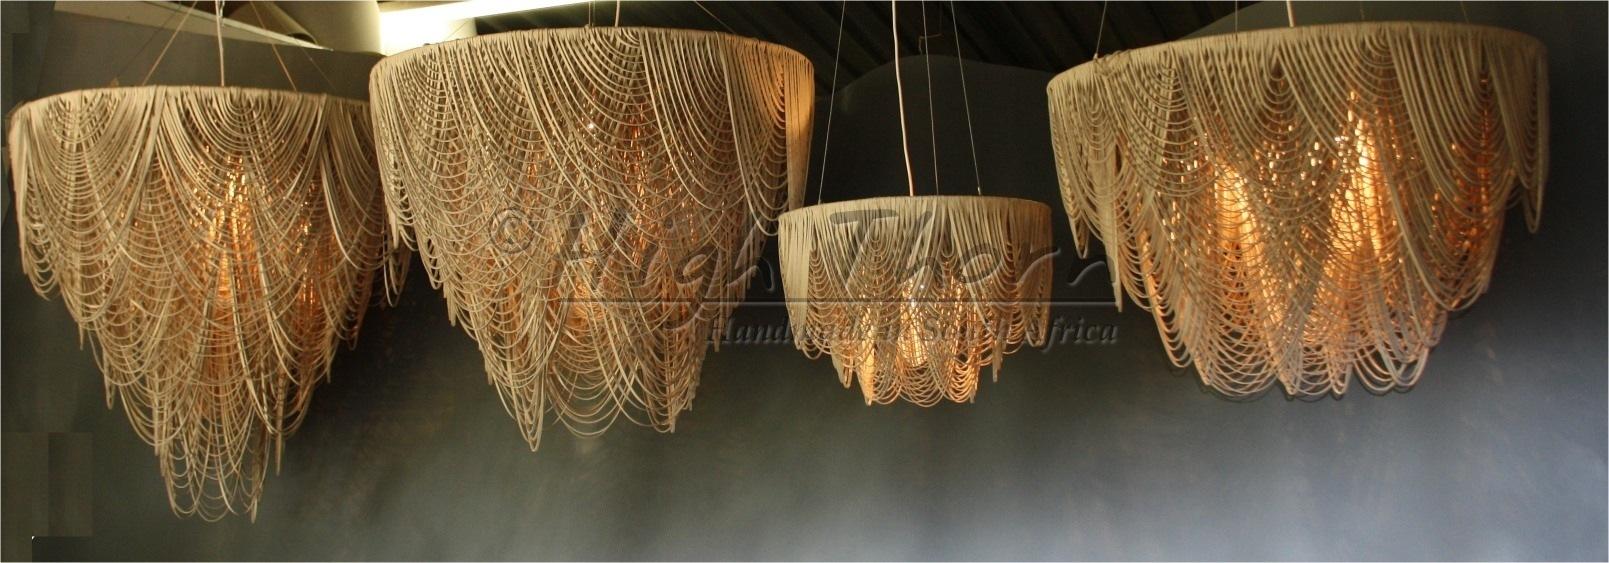 High Thorn Handmade In South Africa Lighting